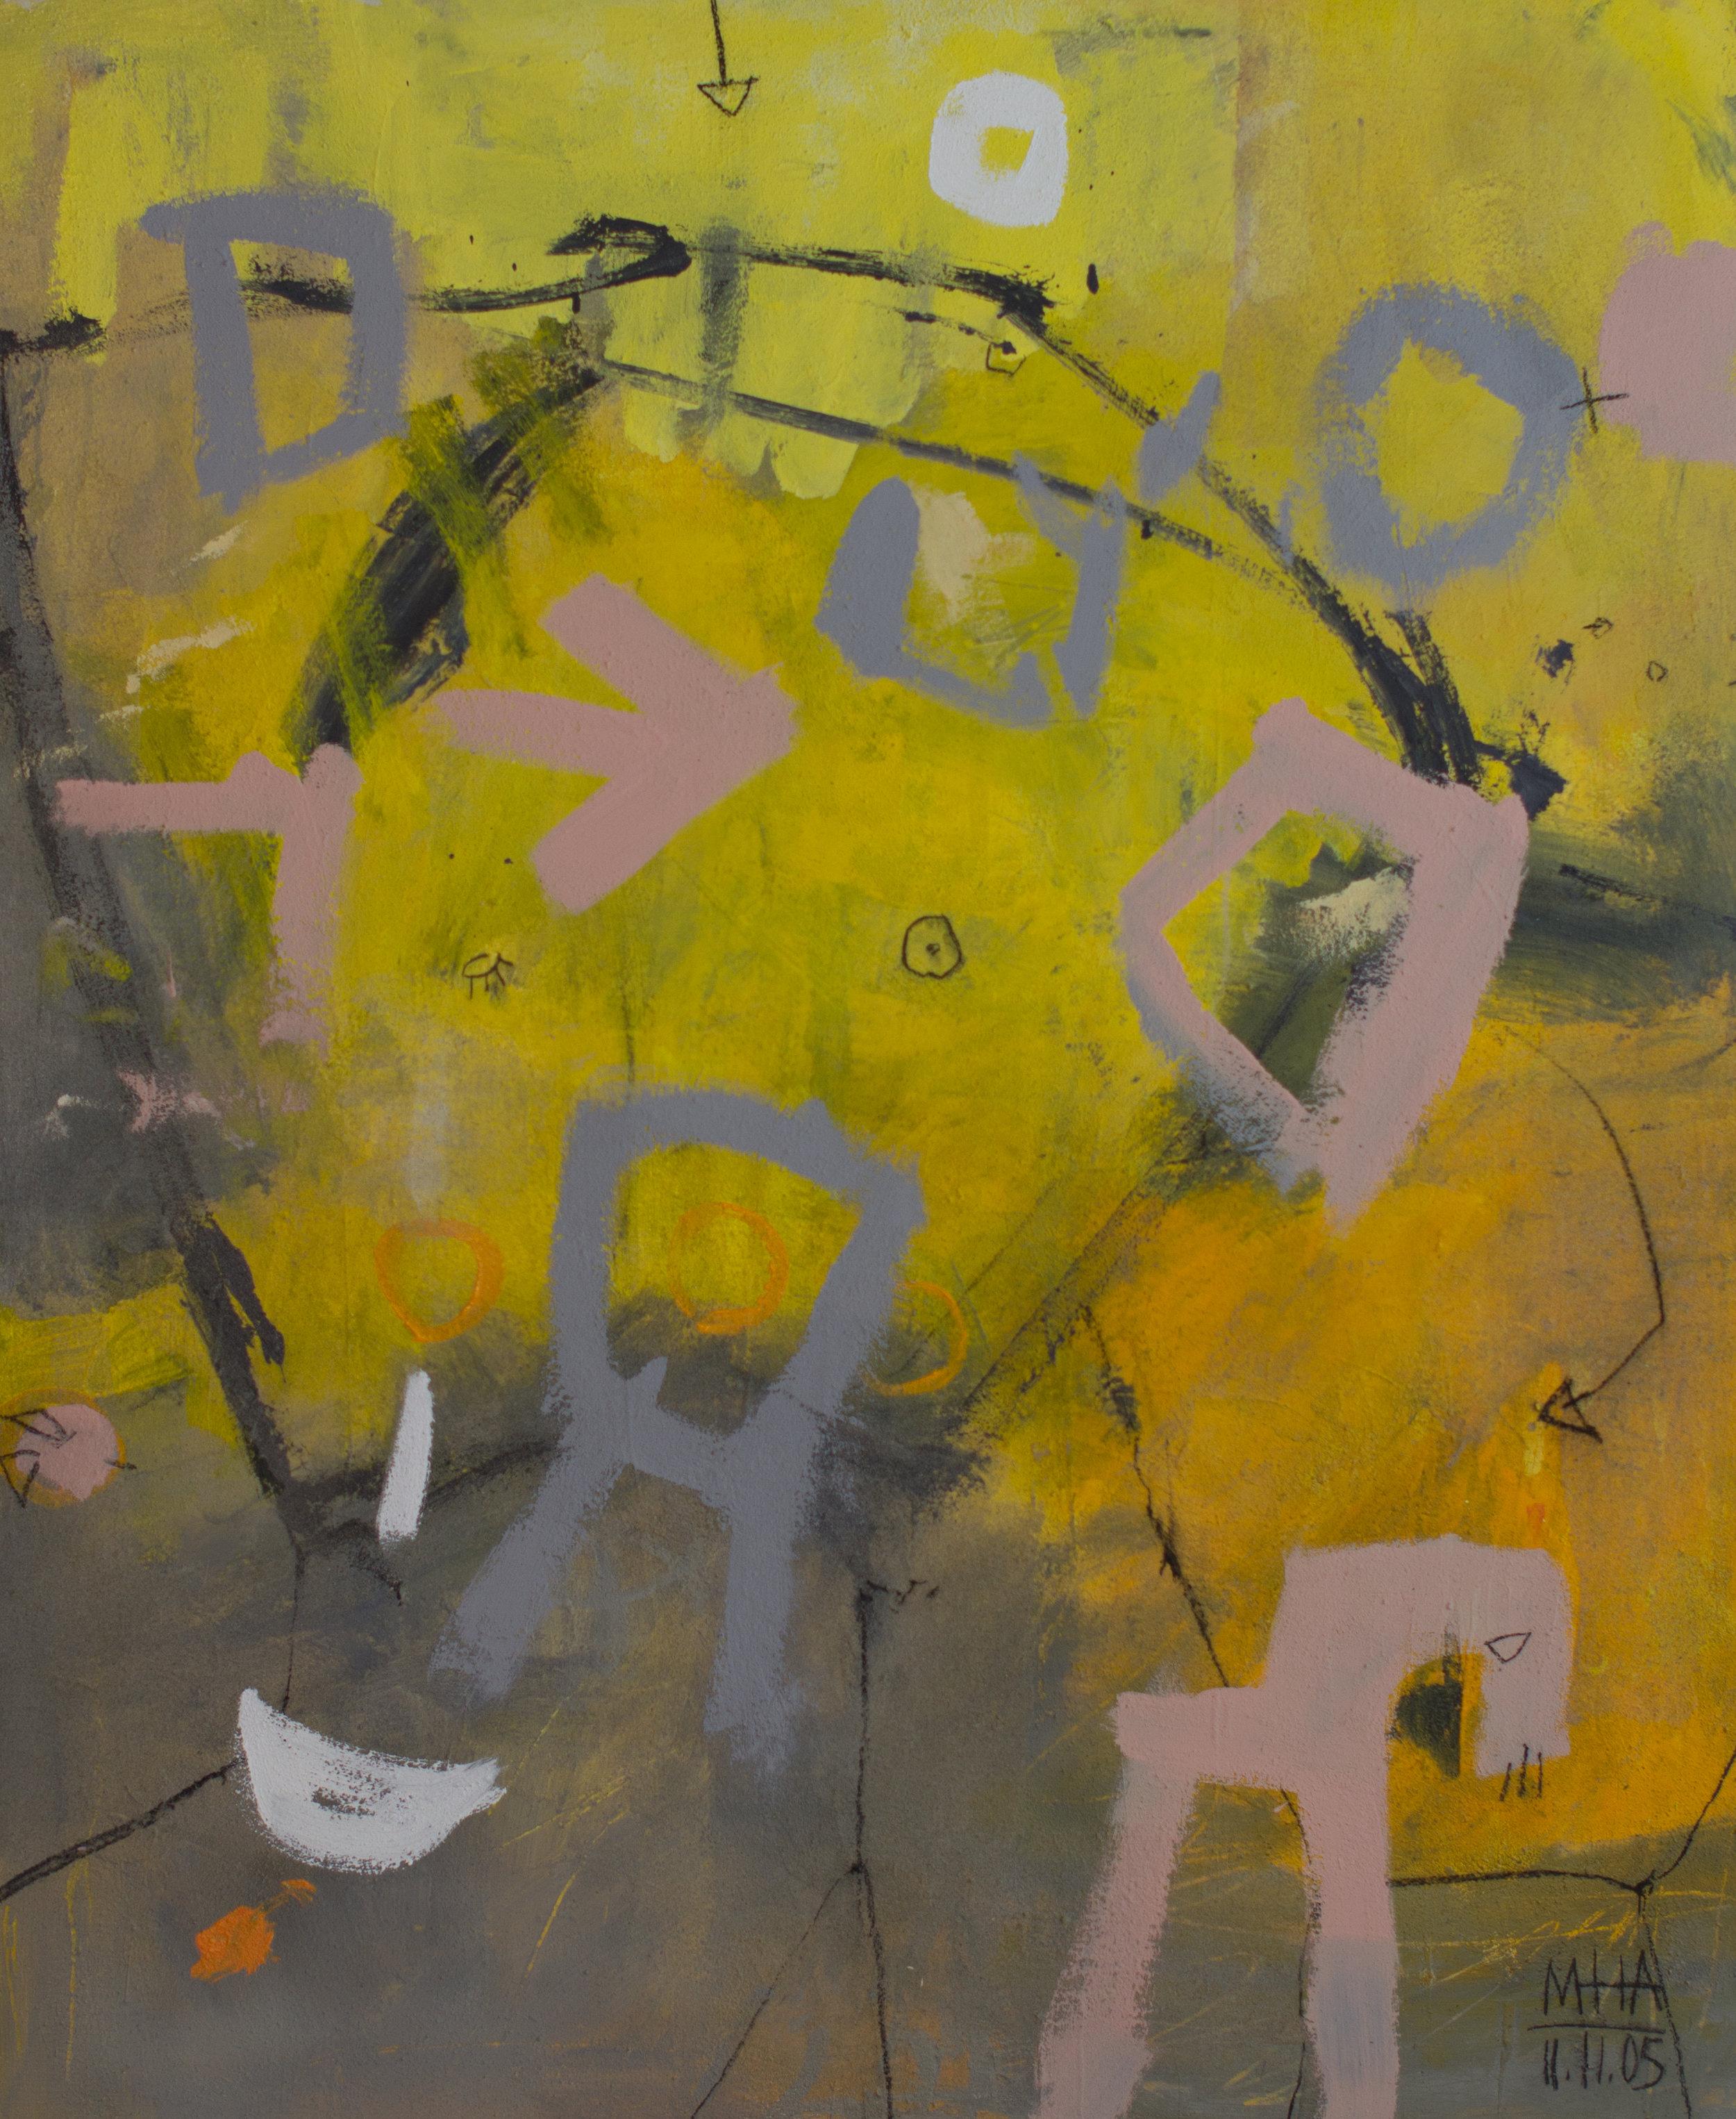 Im Kreis , 2005,Acryl auf Leinwand - Mischtechnik, 100x120 cm